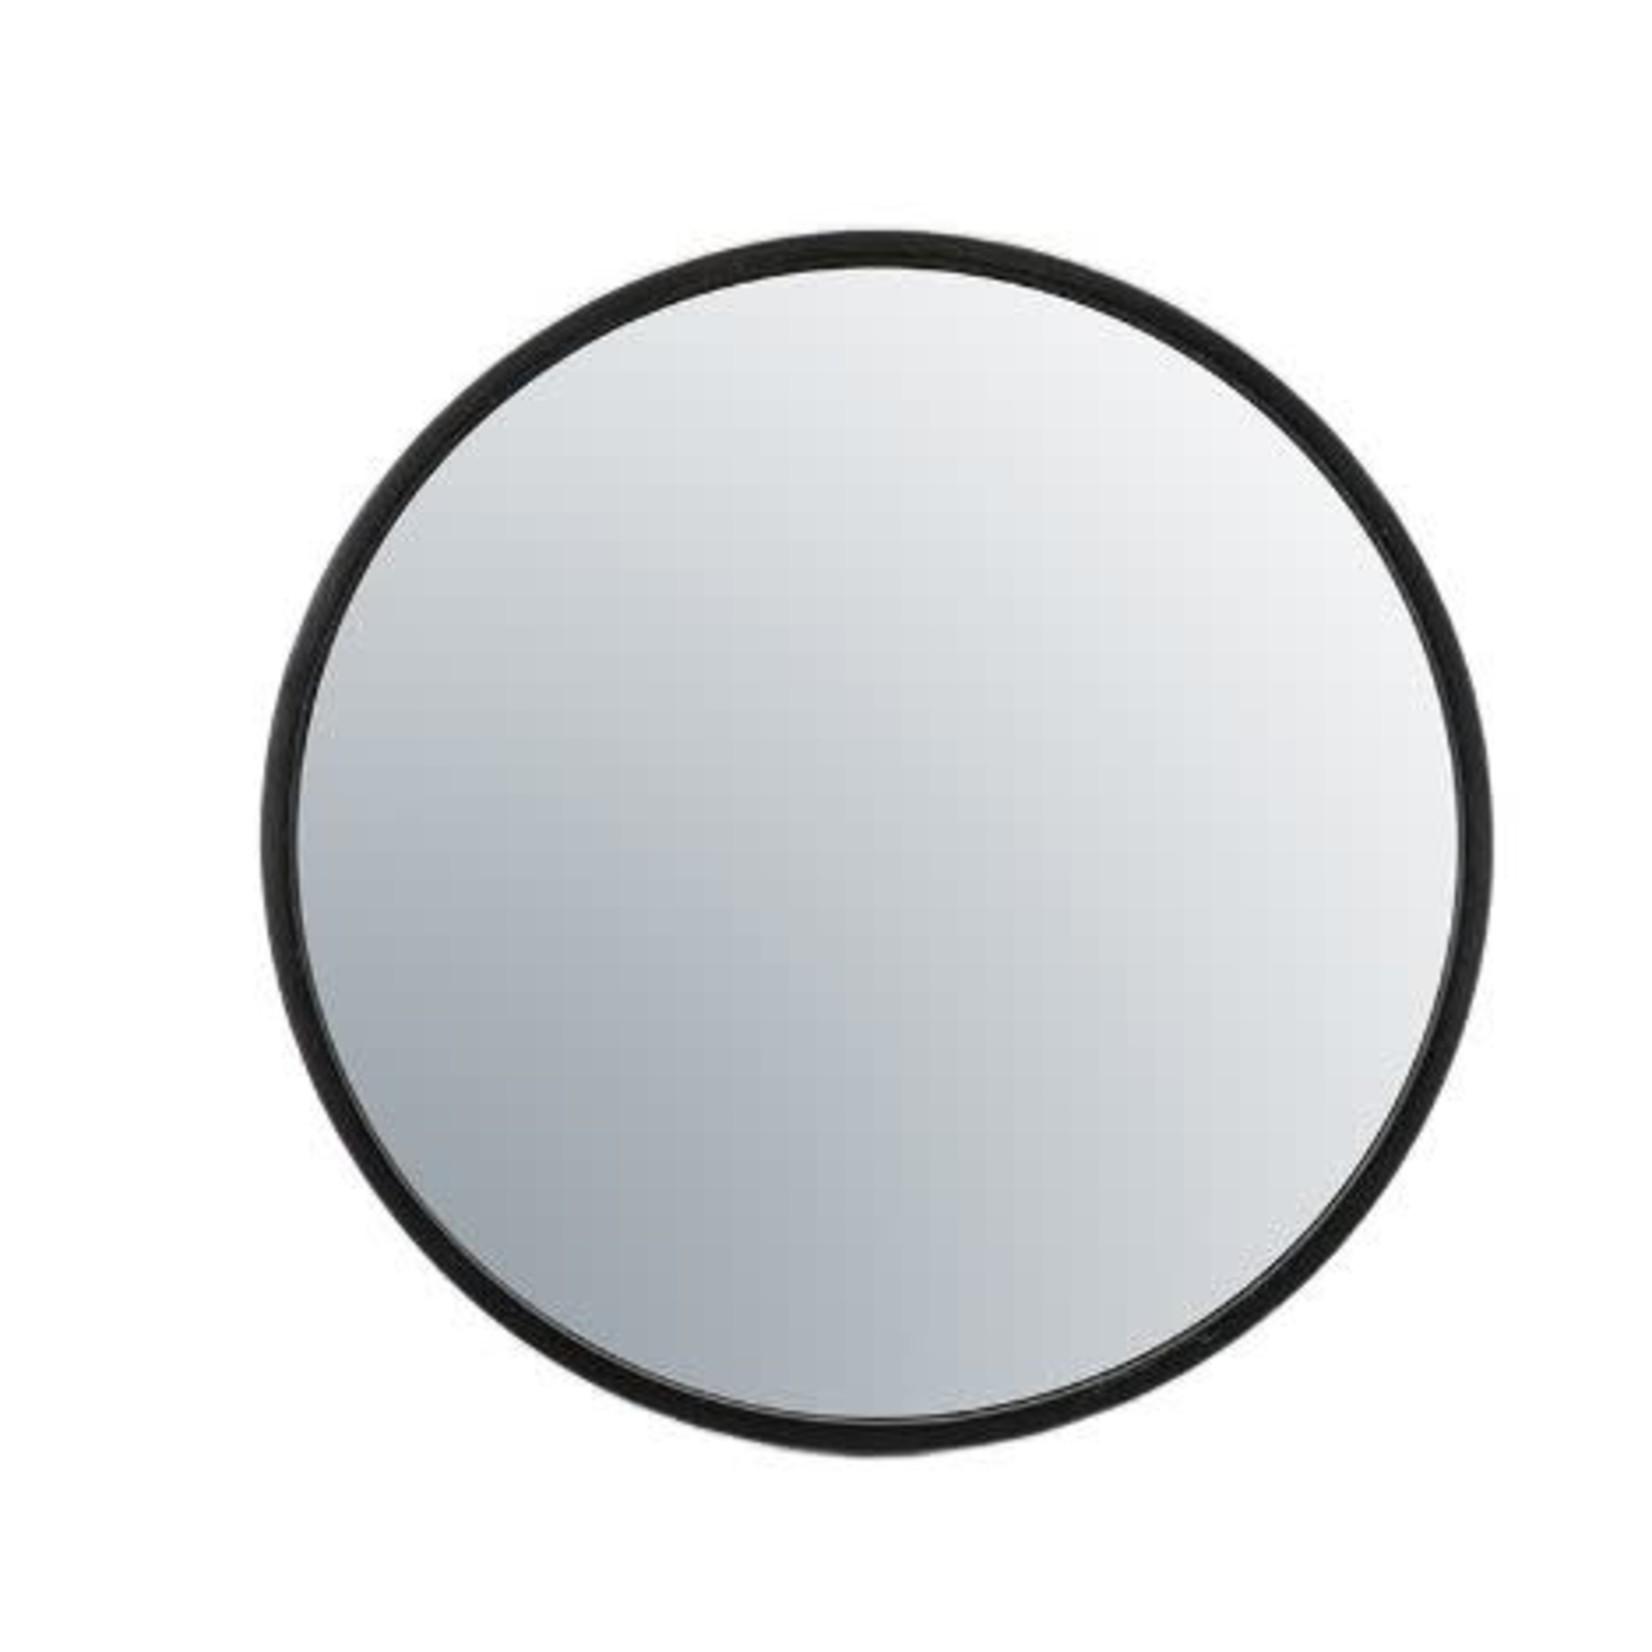 By Boo By Boo spiegel Selfie small - black